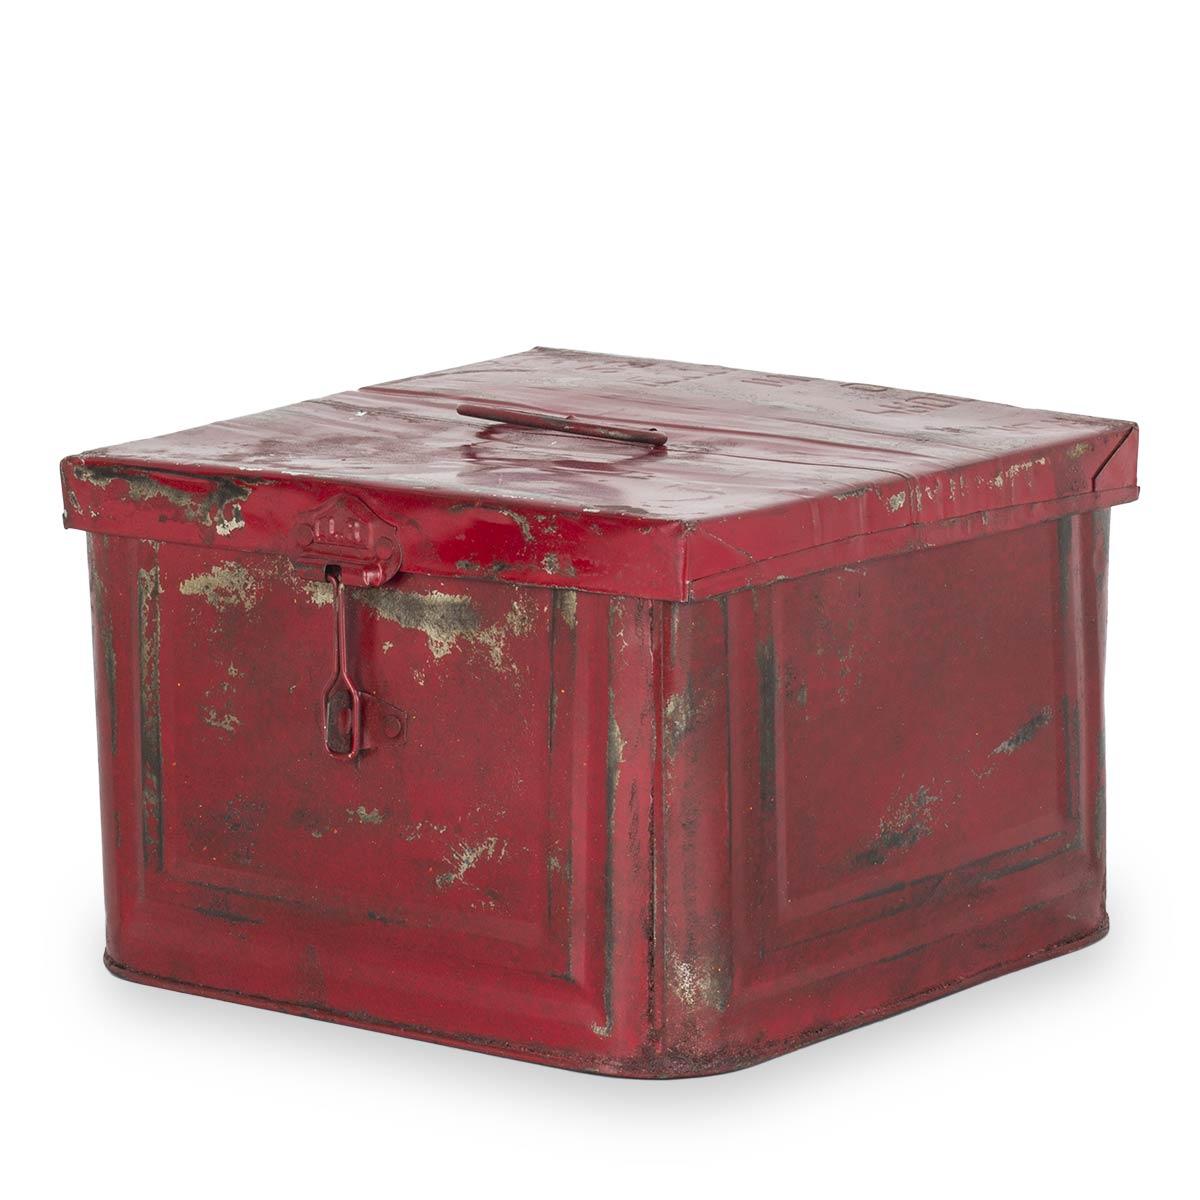 Picture of: Decorative Metal Boxes Vintage Boxes By Francisco Segarra